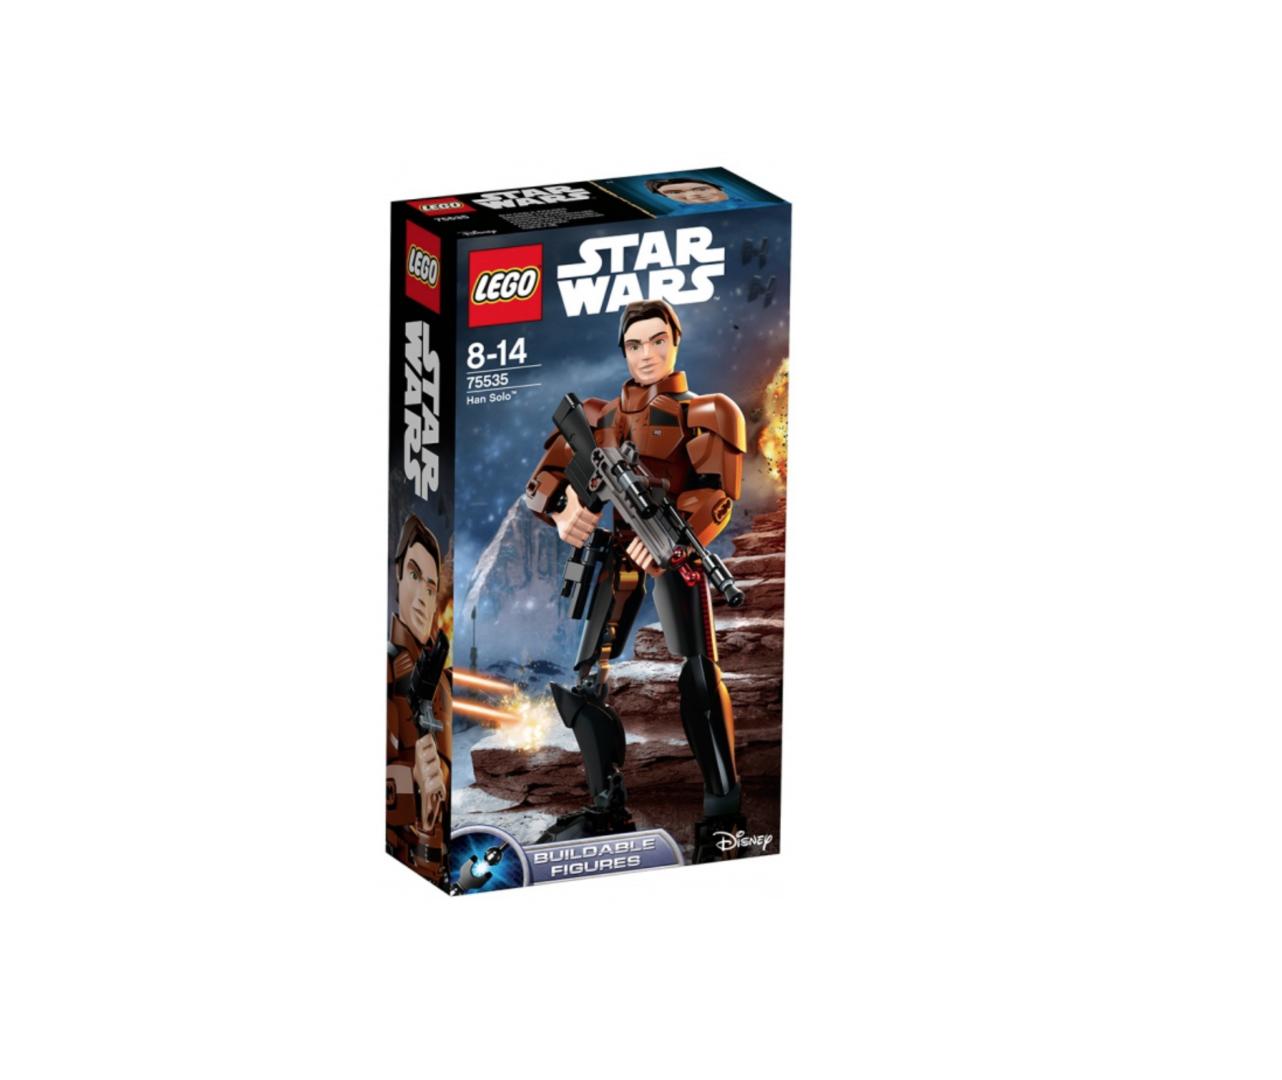 XXX LEGO  STAR WARS  HAN SOLO 75535 JOUET JEU JEUX ITEM 6213569 CONSTRUCTION ENFANT NOEL NEUF 5702016112108 COMASOUND KARTEL